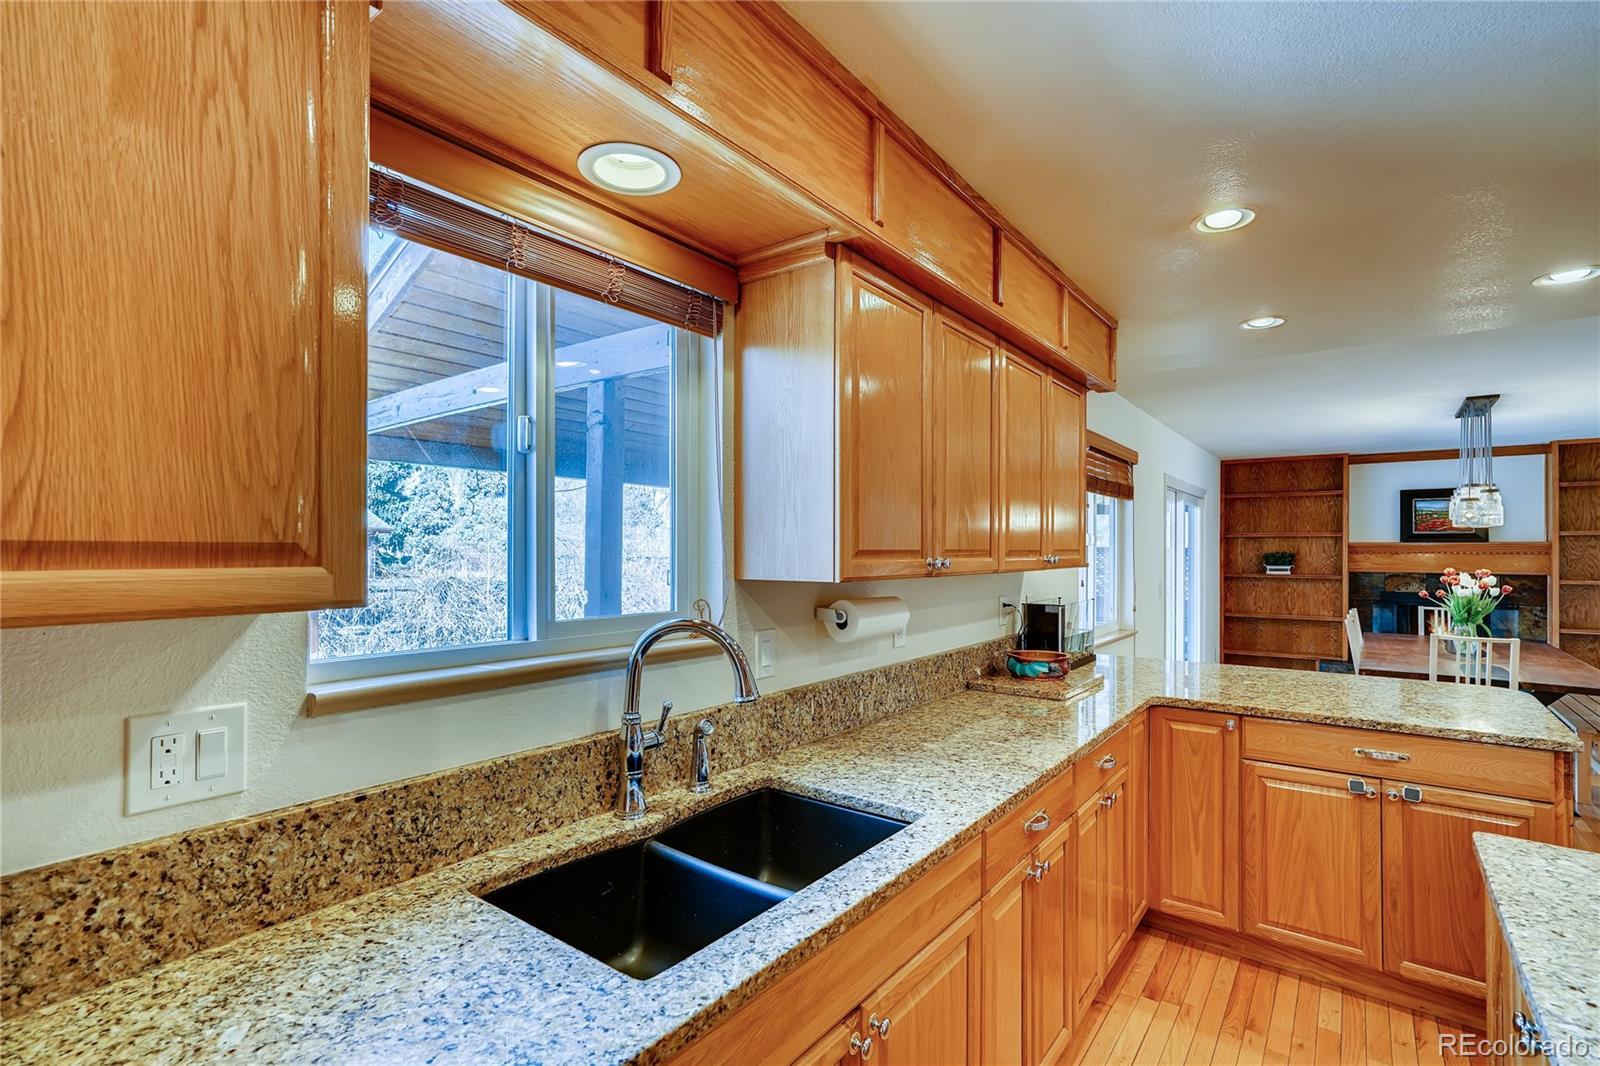 MLS# 9748380 - 13 - 8897 W Woodard Drive, Lakewood, CO 80227